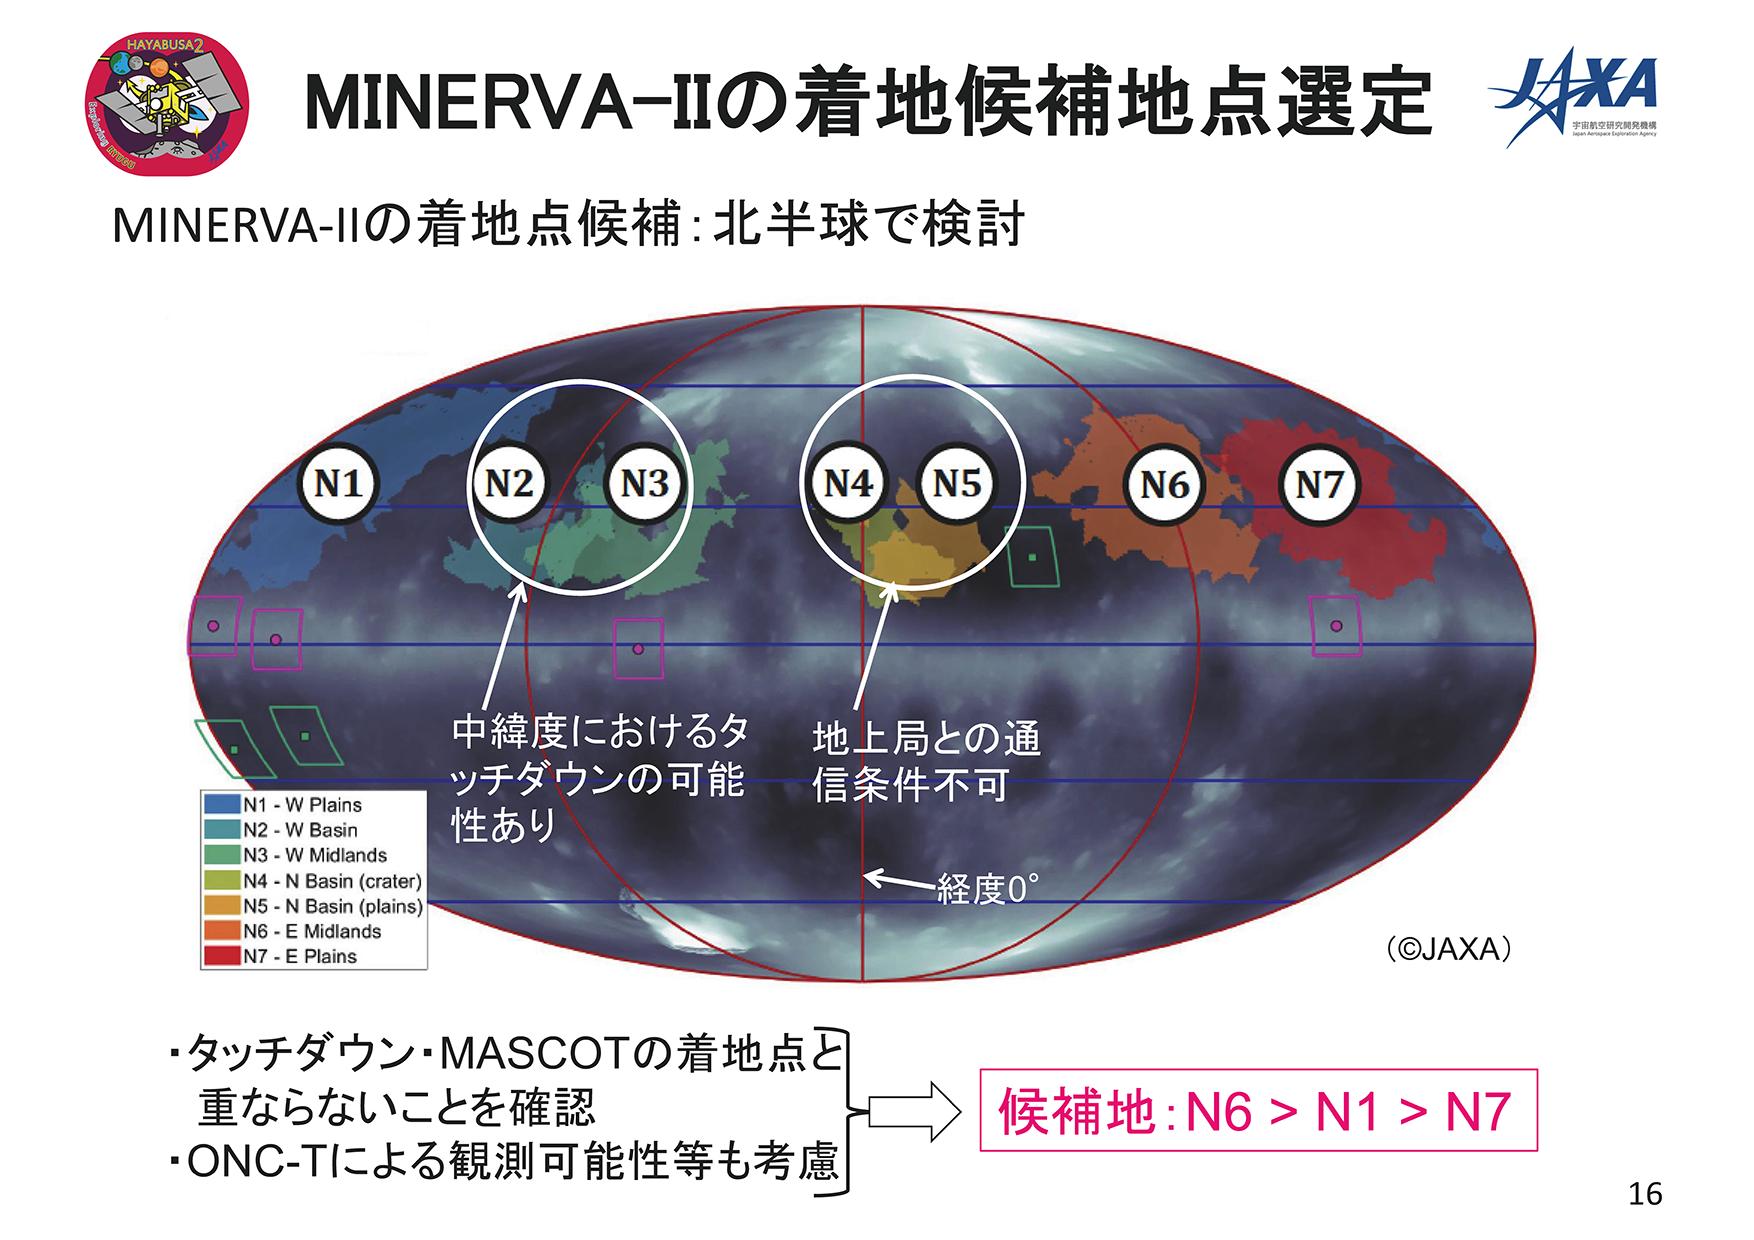 f:id:Imamura:20180921145506p:plain